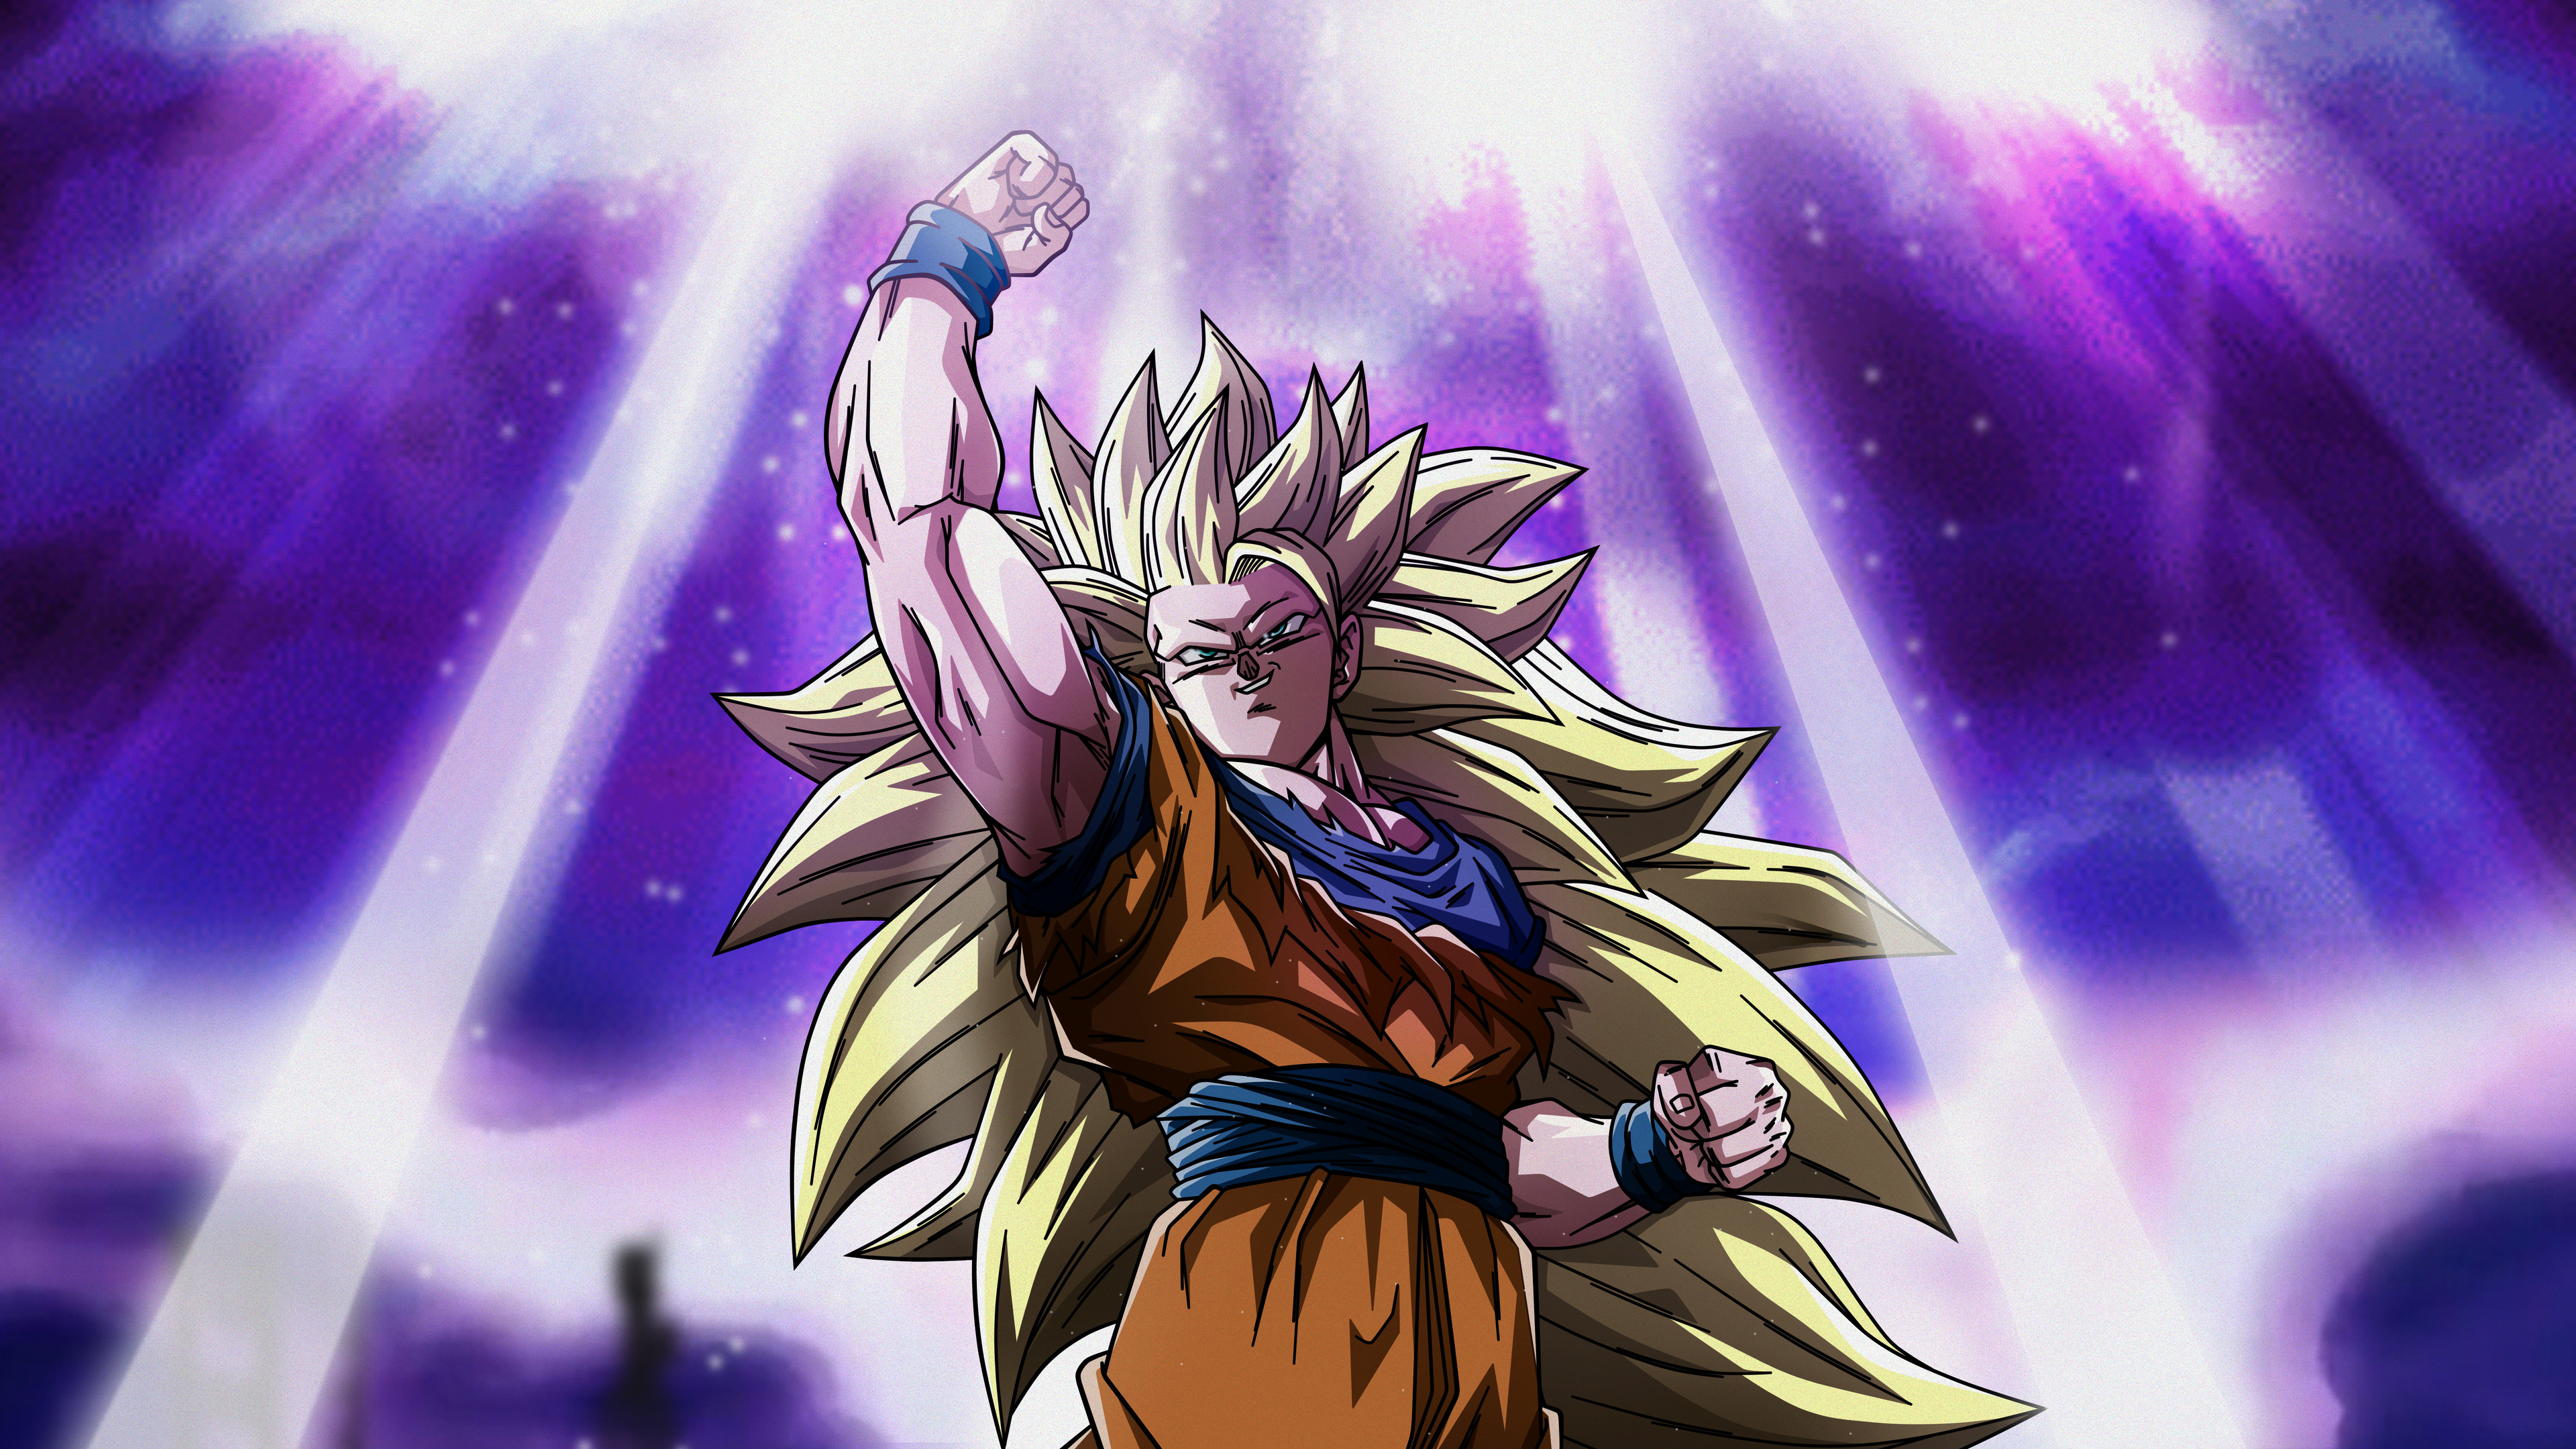 Dragon Ball Z Goku 4k hd-wallpapers, goku wallpapers ...